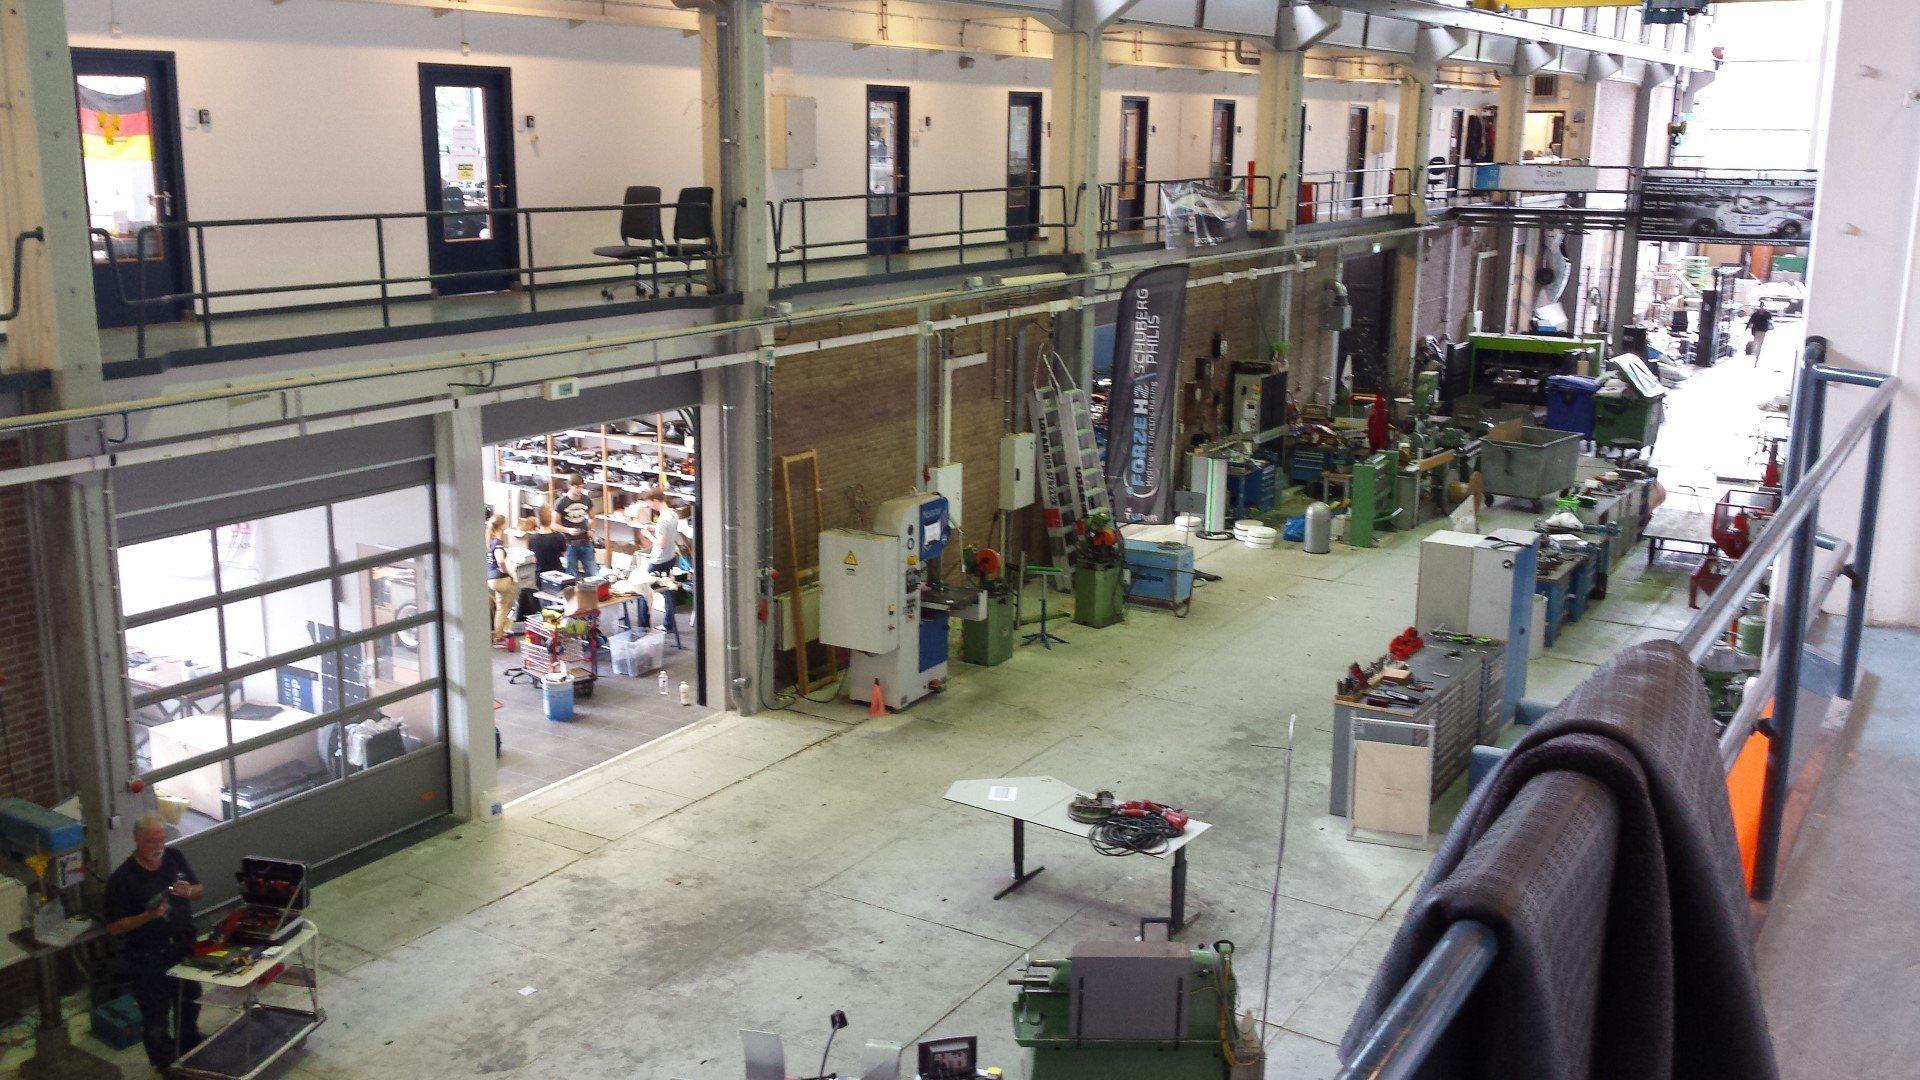 Delft university selected Compact doors